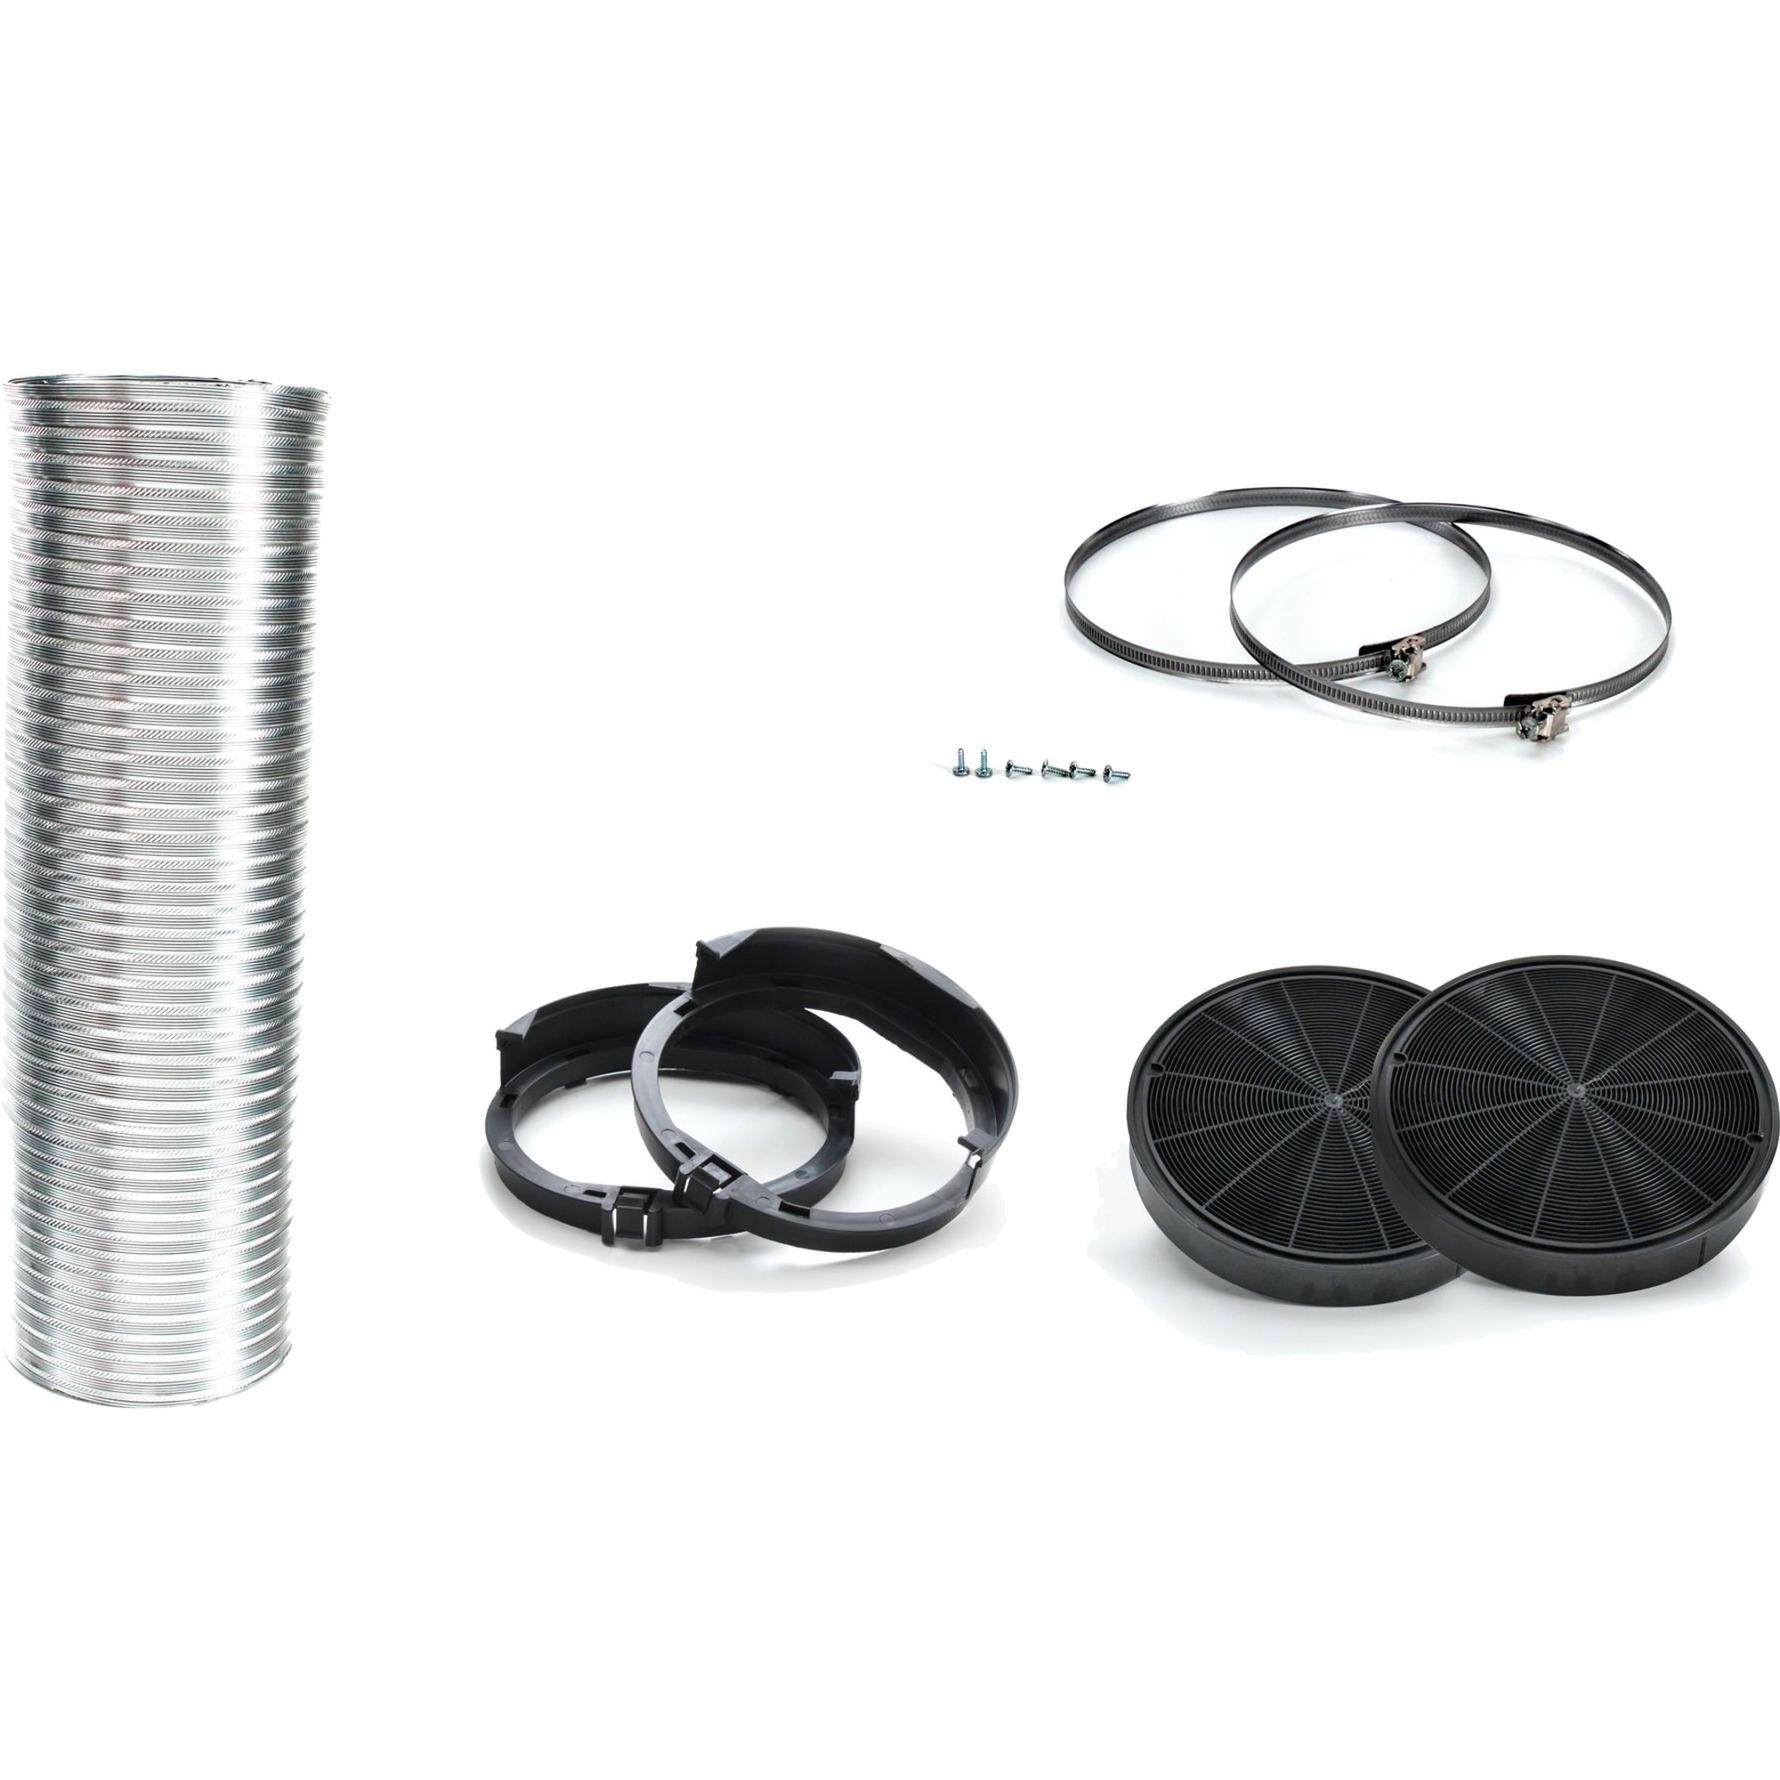 LZ55750 accesorio para campana de estufa, Set de modificación